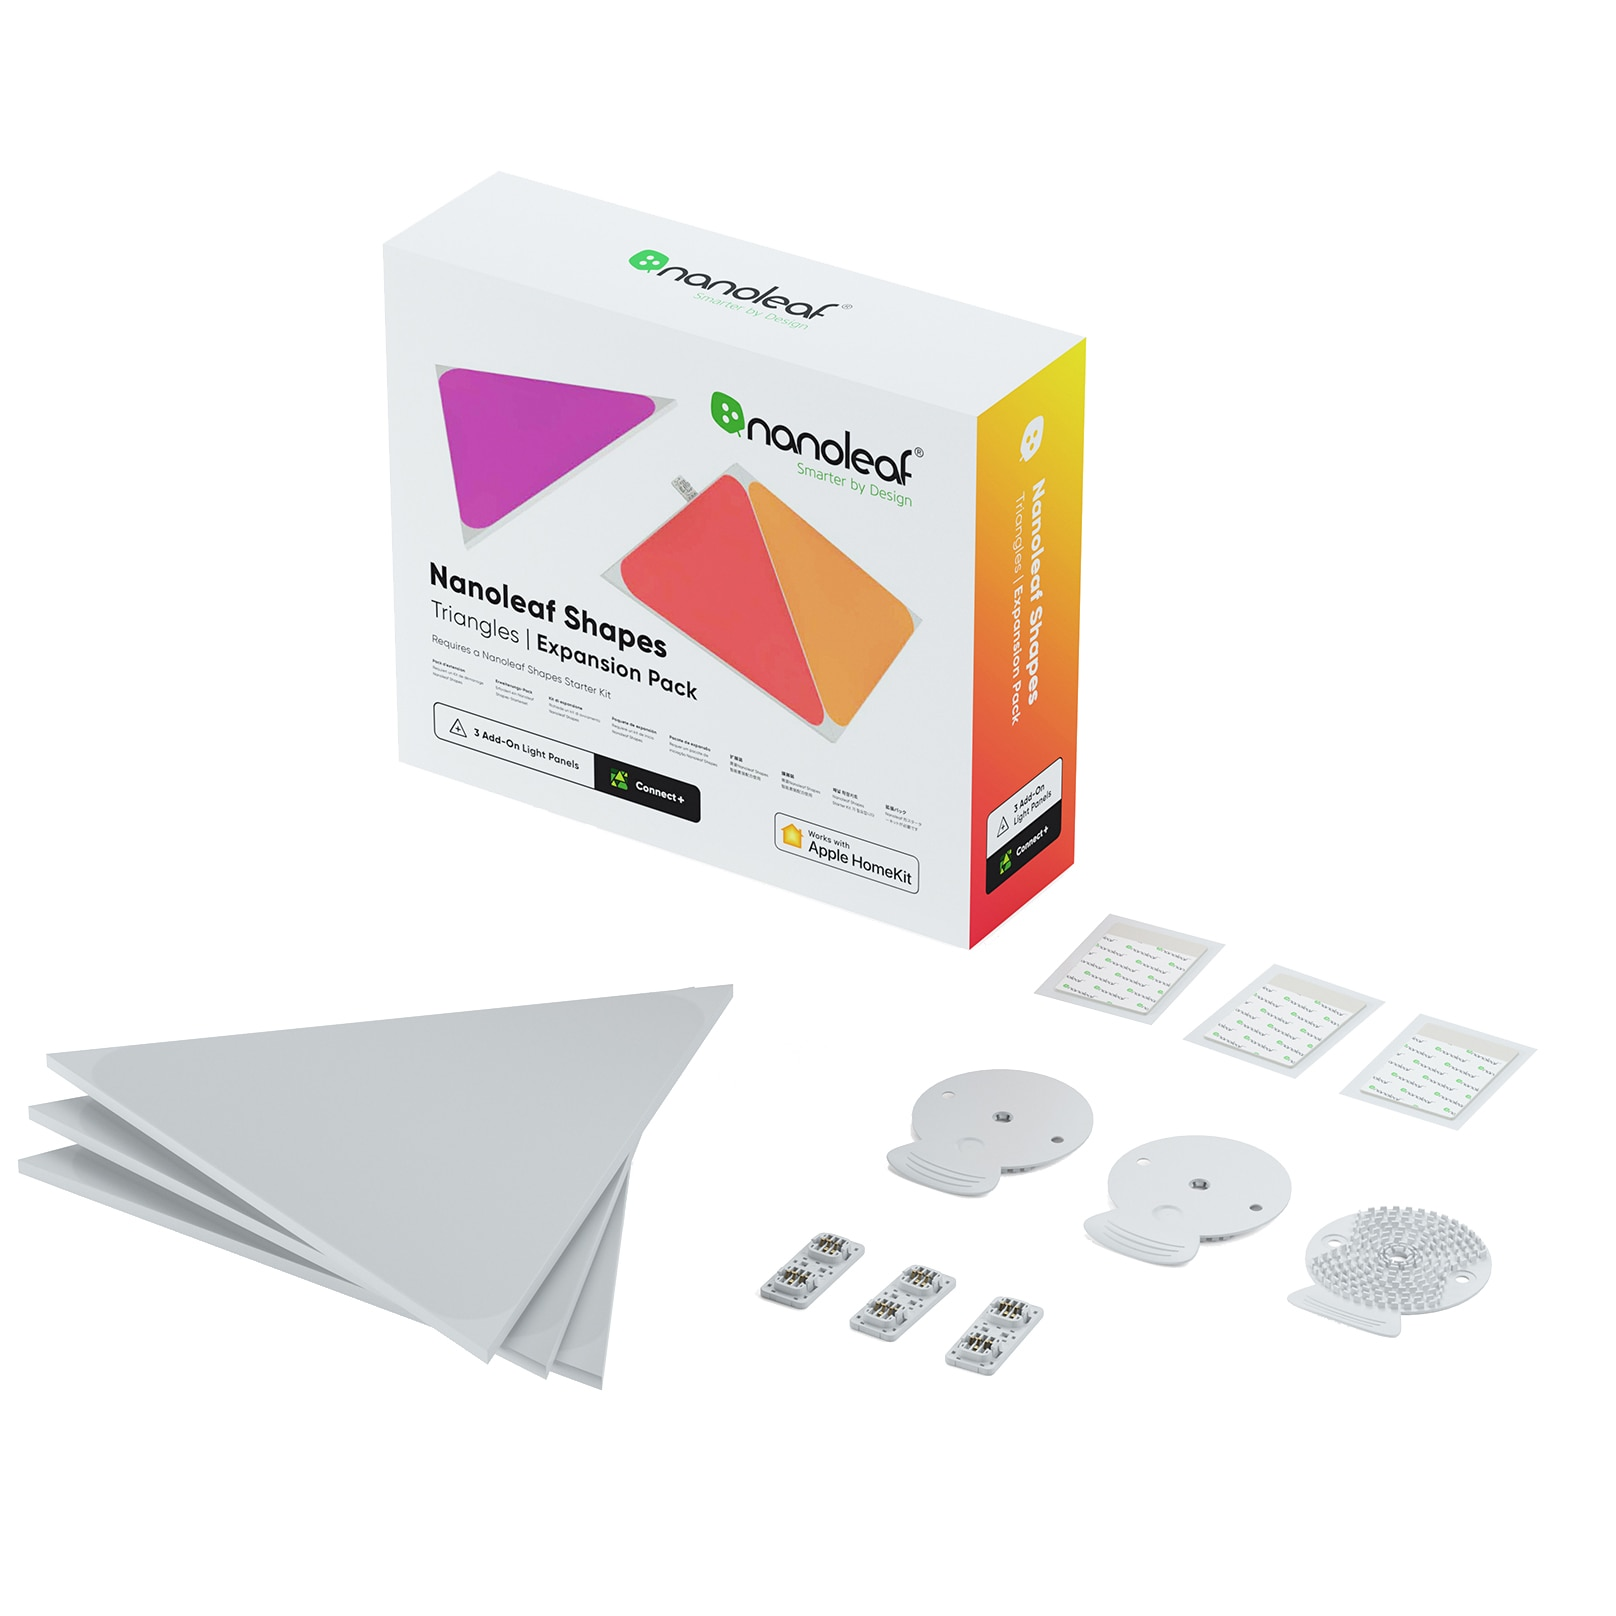 Fotografie Panouri luminoase LED modulare inteligente Nanoleaf pentru extindere Kit Shapes Triangles, RGBW, 240 lm, 3 panouri